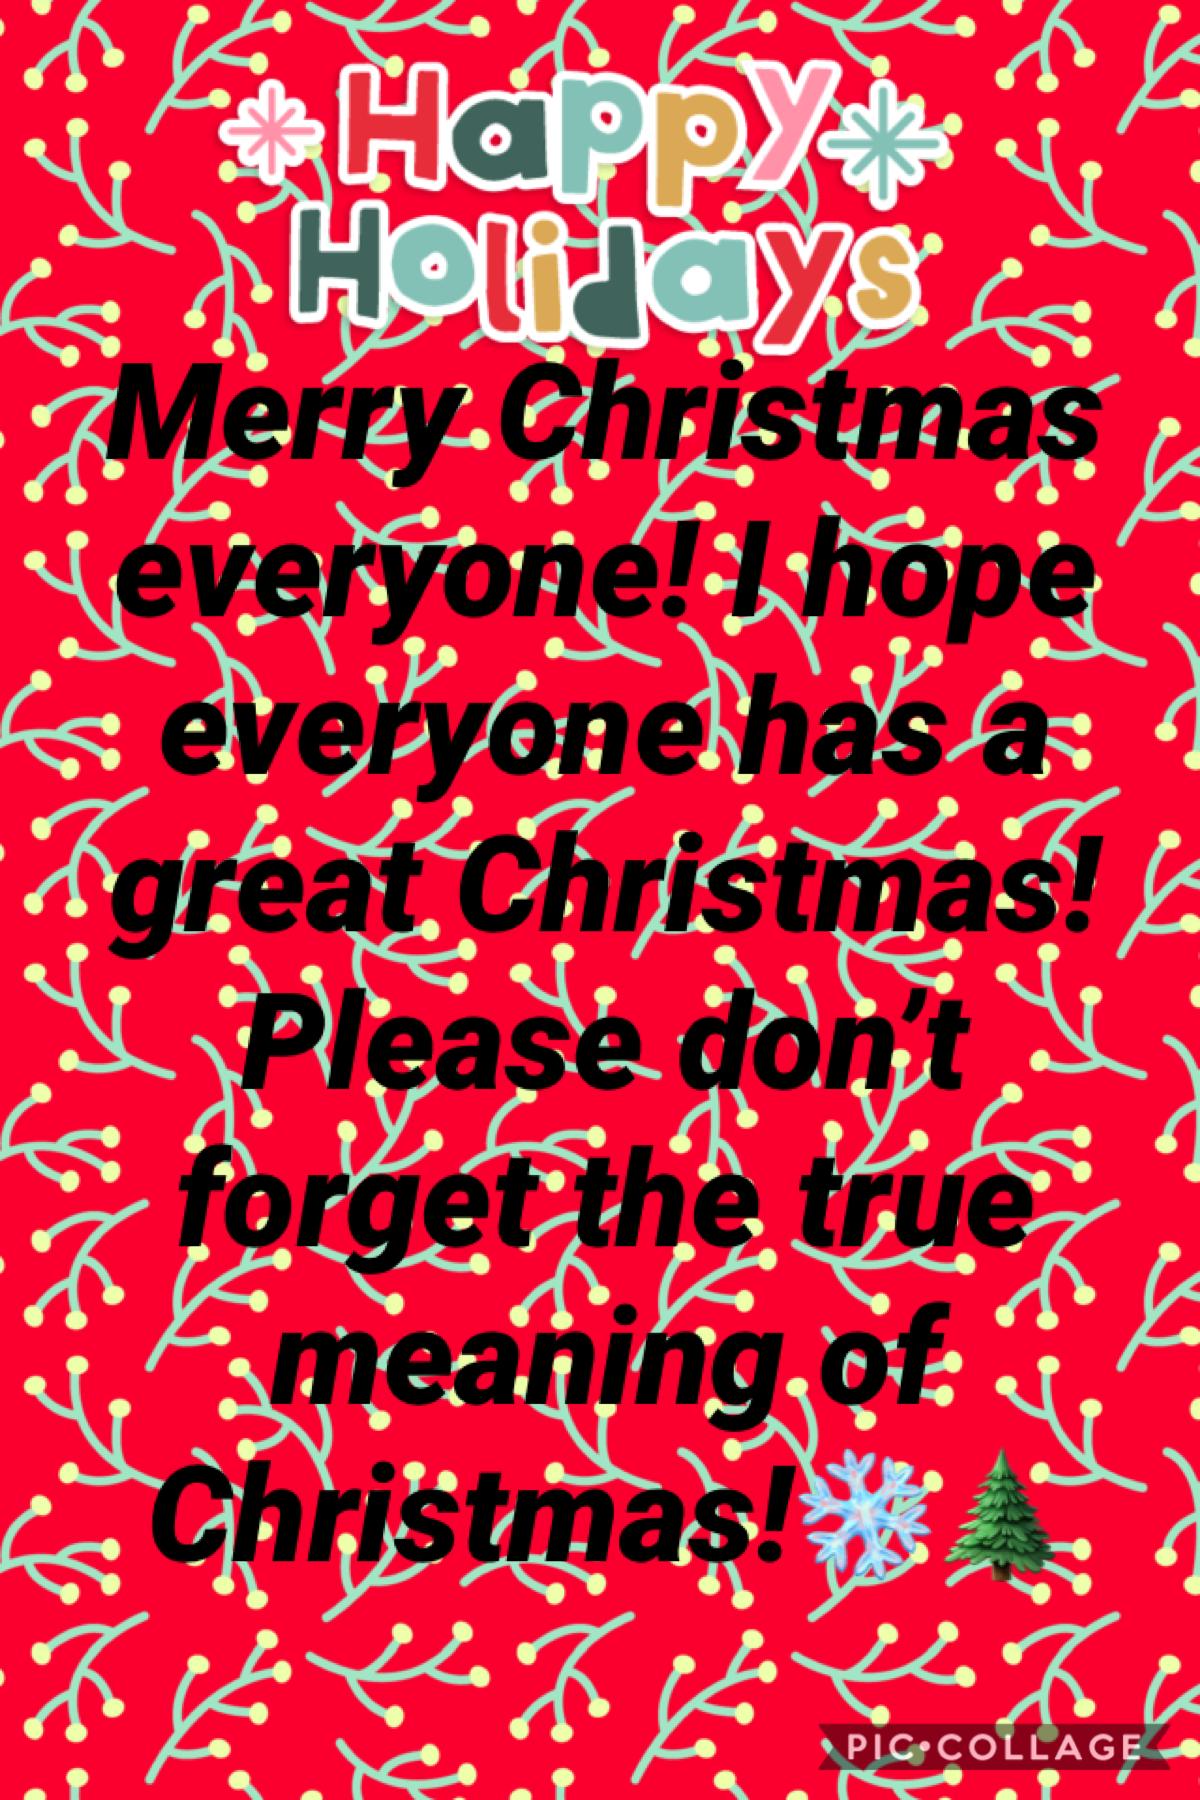 Merry Christmas everyone🎄🎁